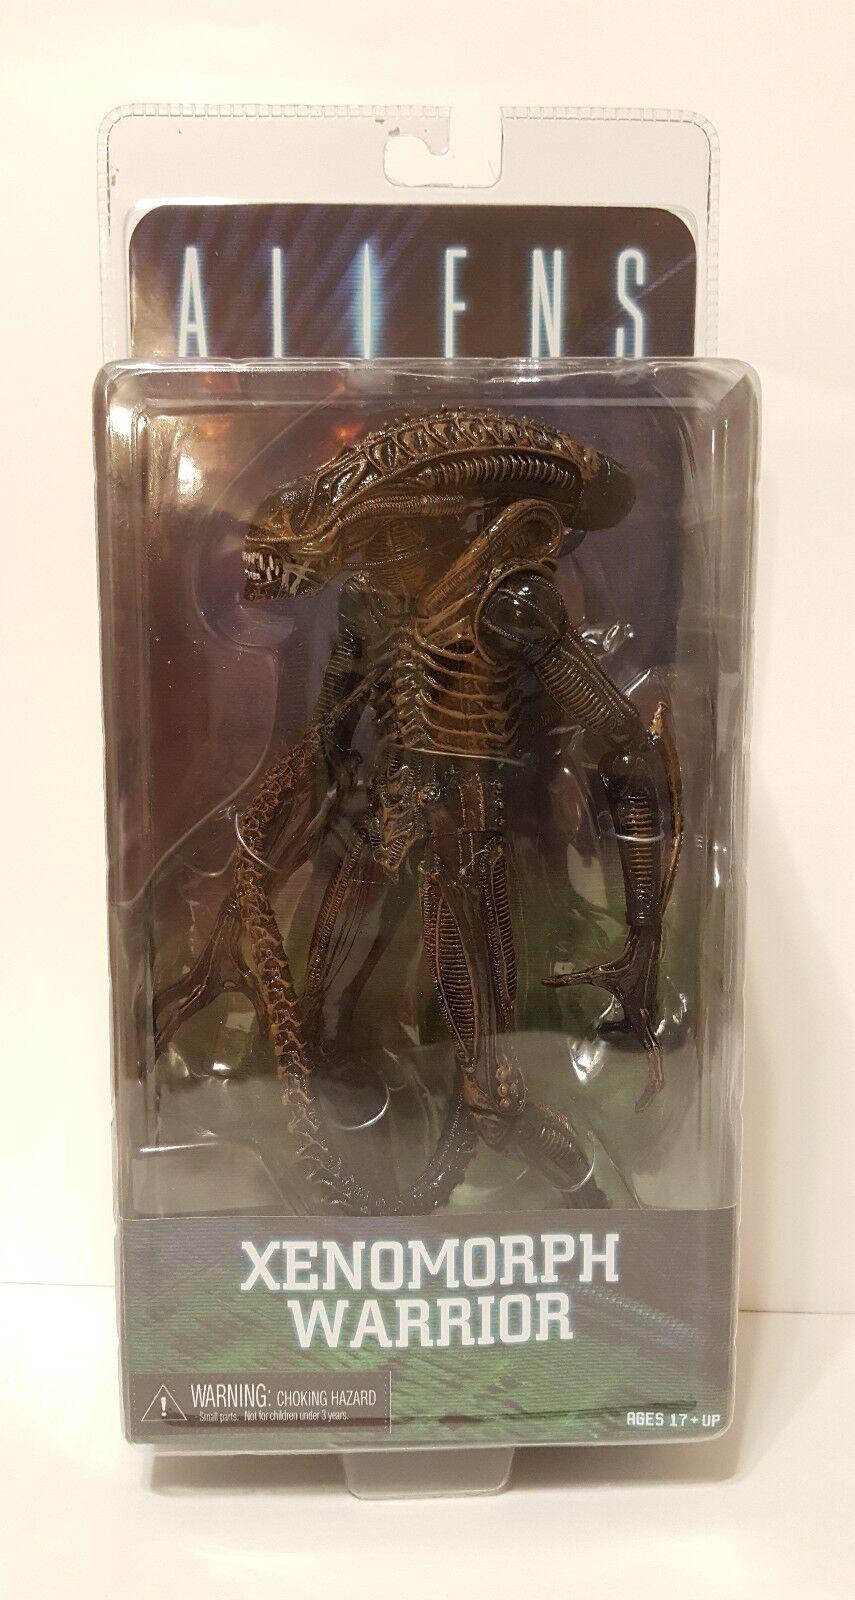 Aliens Xenomorph Warrior Action Action Action Figure Neca 2013 New d42435